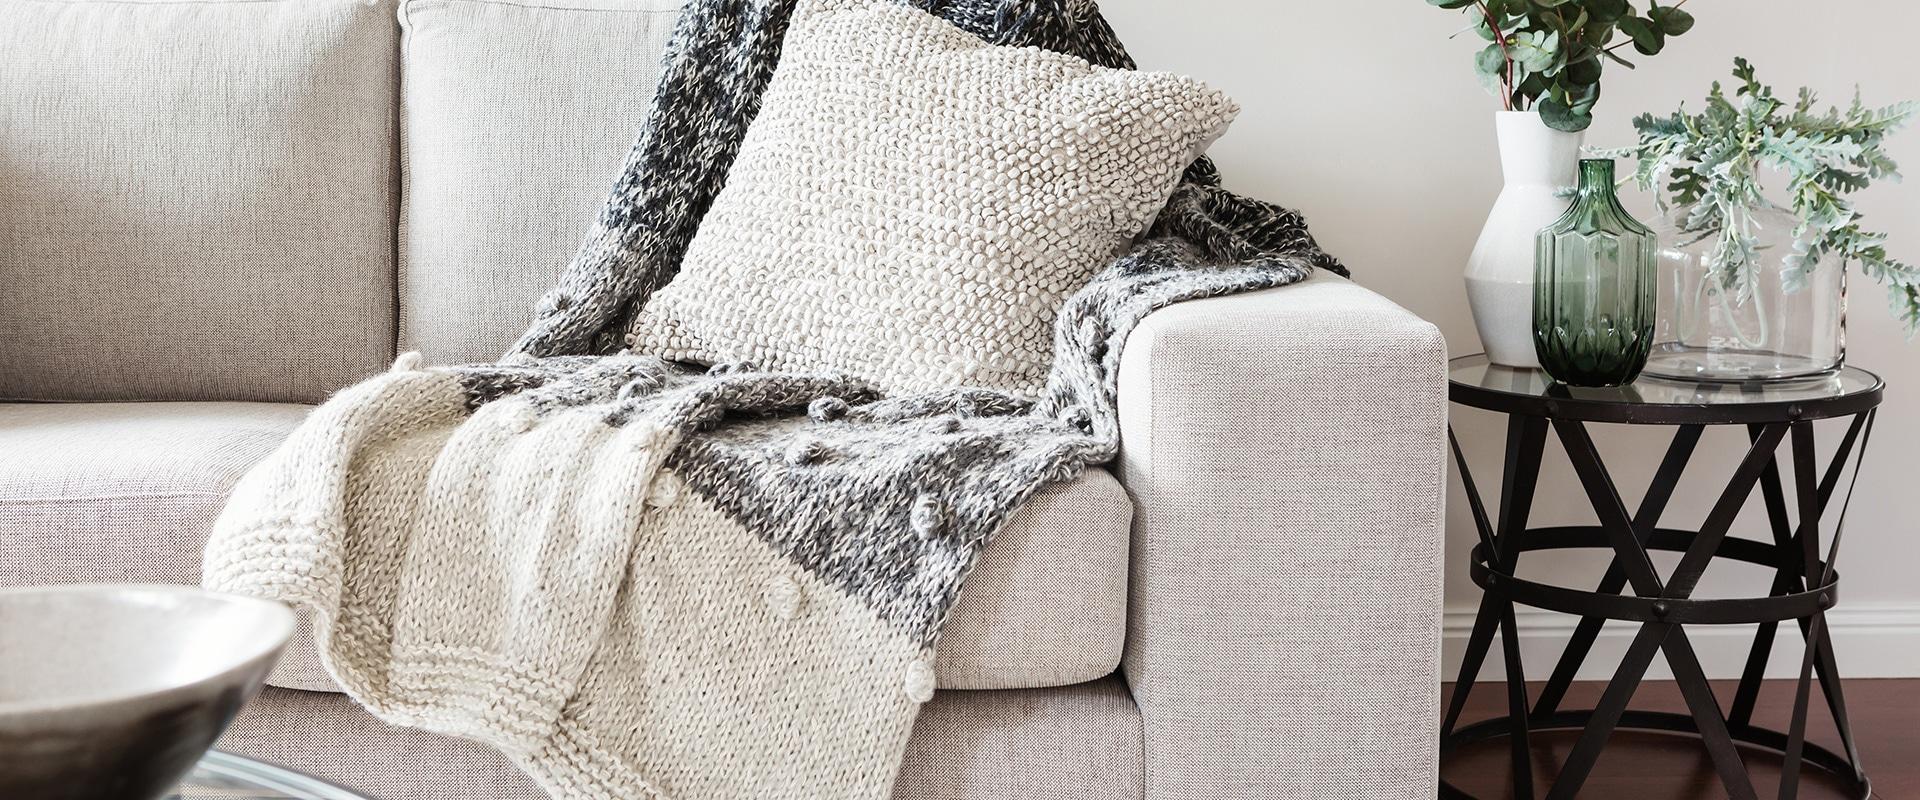 textiles modern style